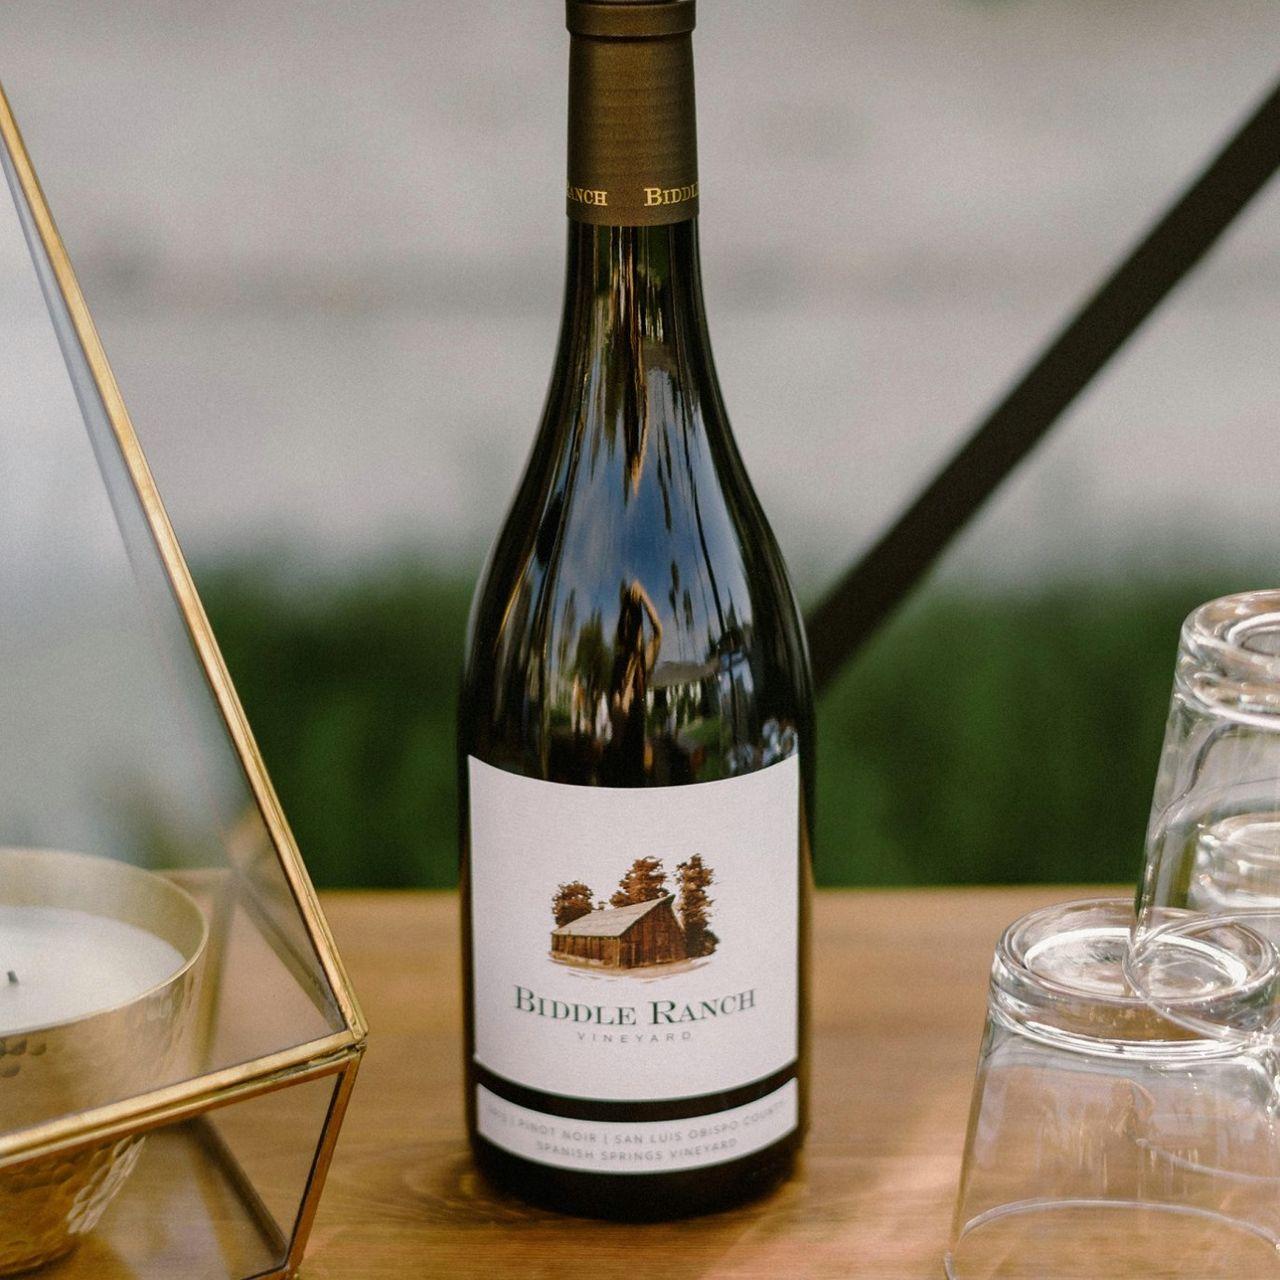 Biddle Ranch Vineyard San Luis Obispo Ca Opentable